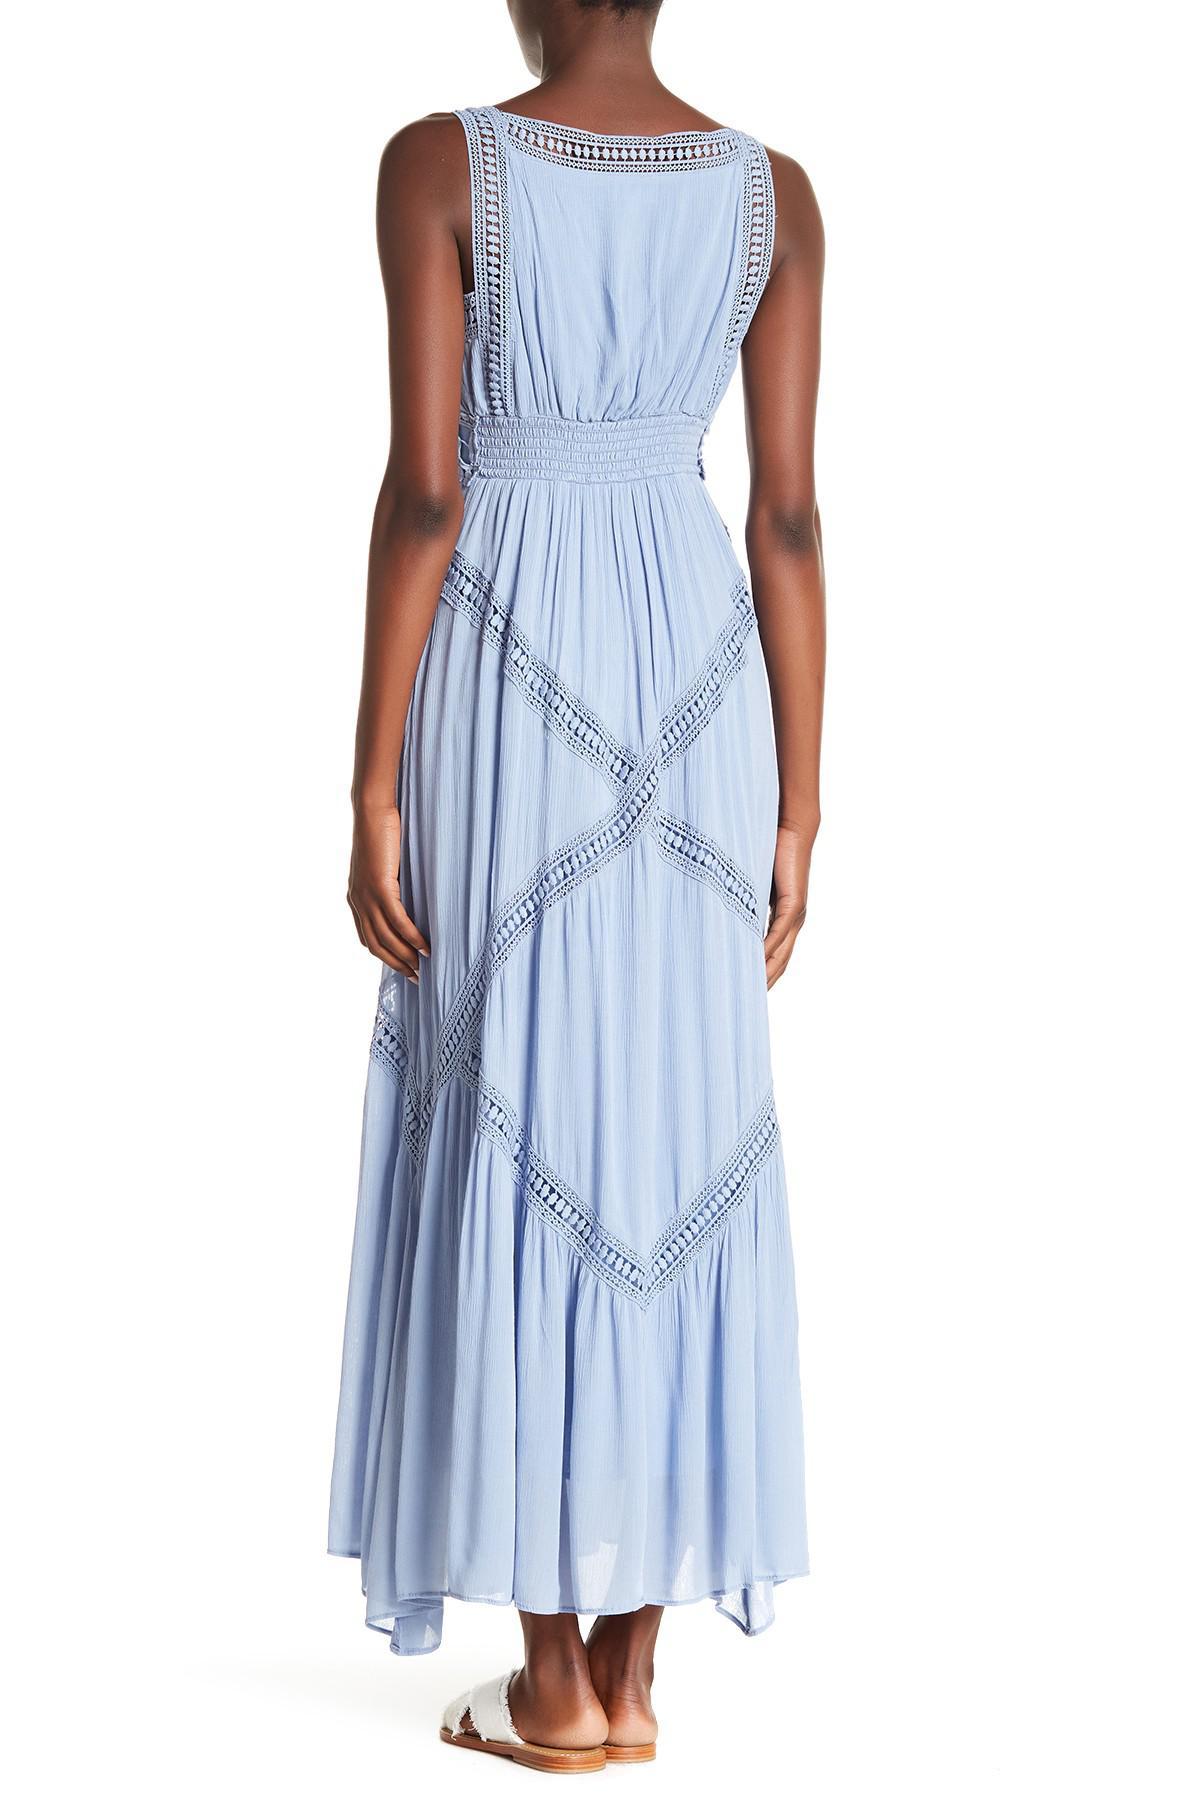 shopping genuine enjoy lowest price Crochet Lace Maxi Dress